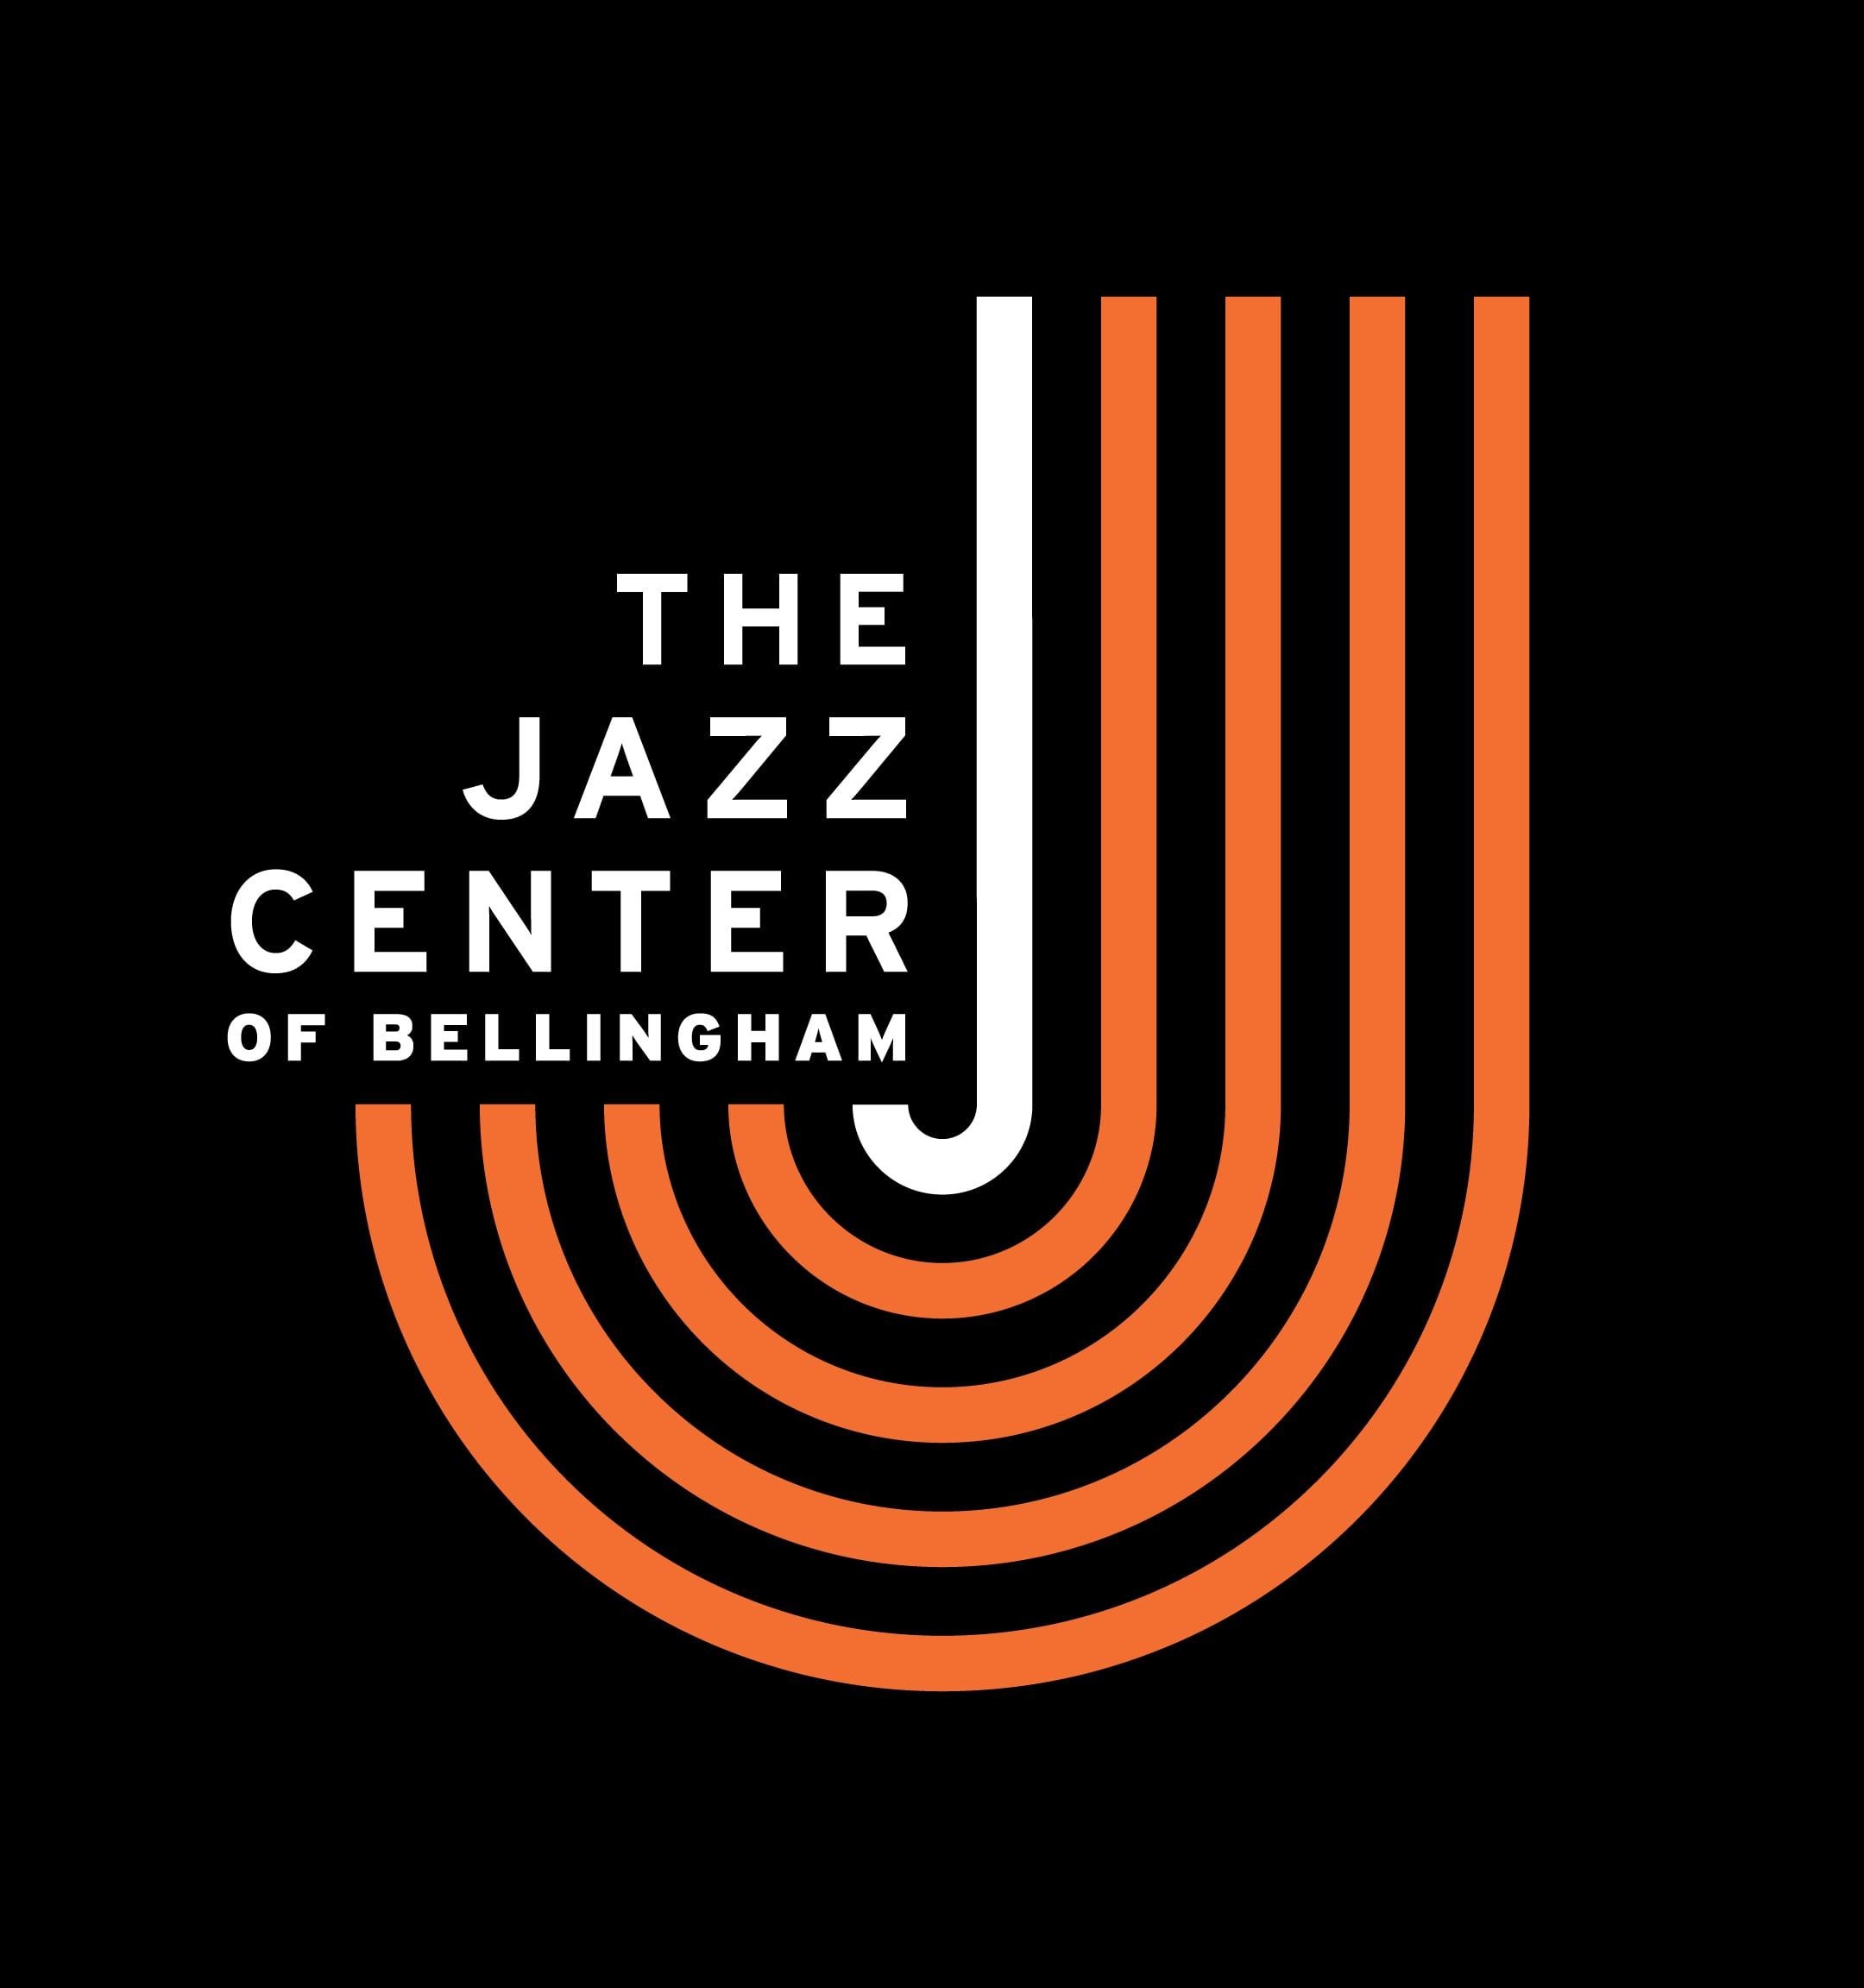 Jazz Center Of Bellingham Karee Wardrop